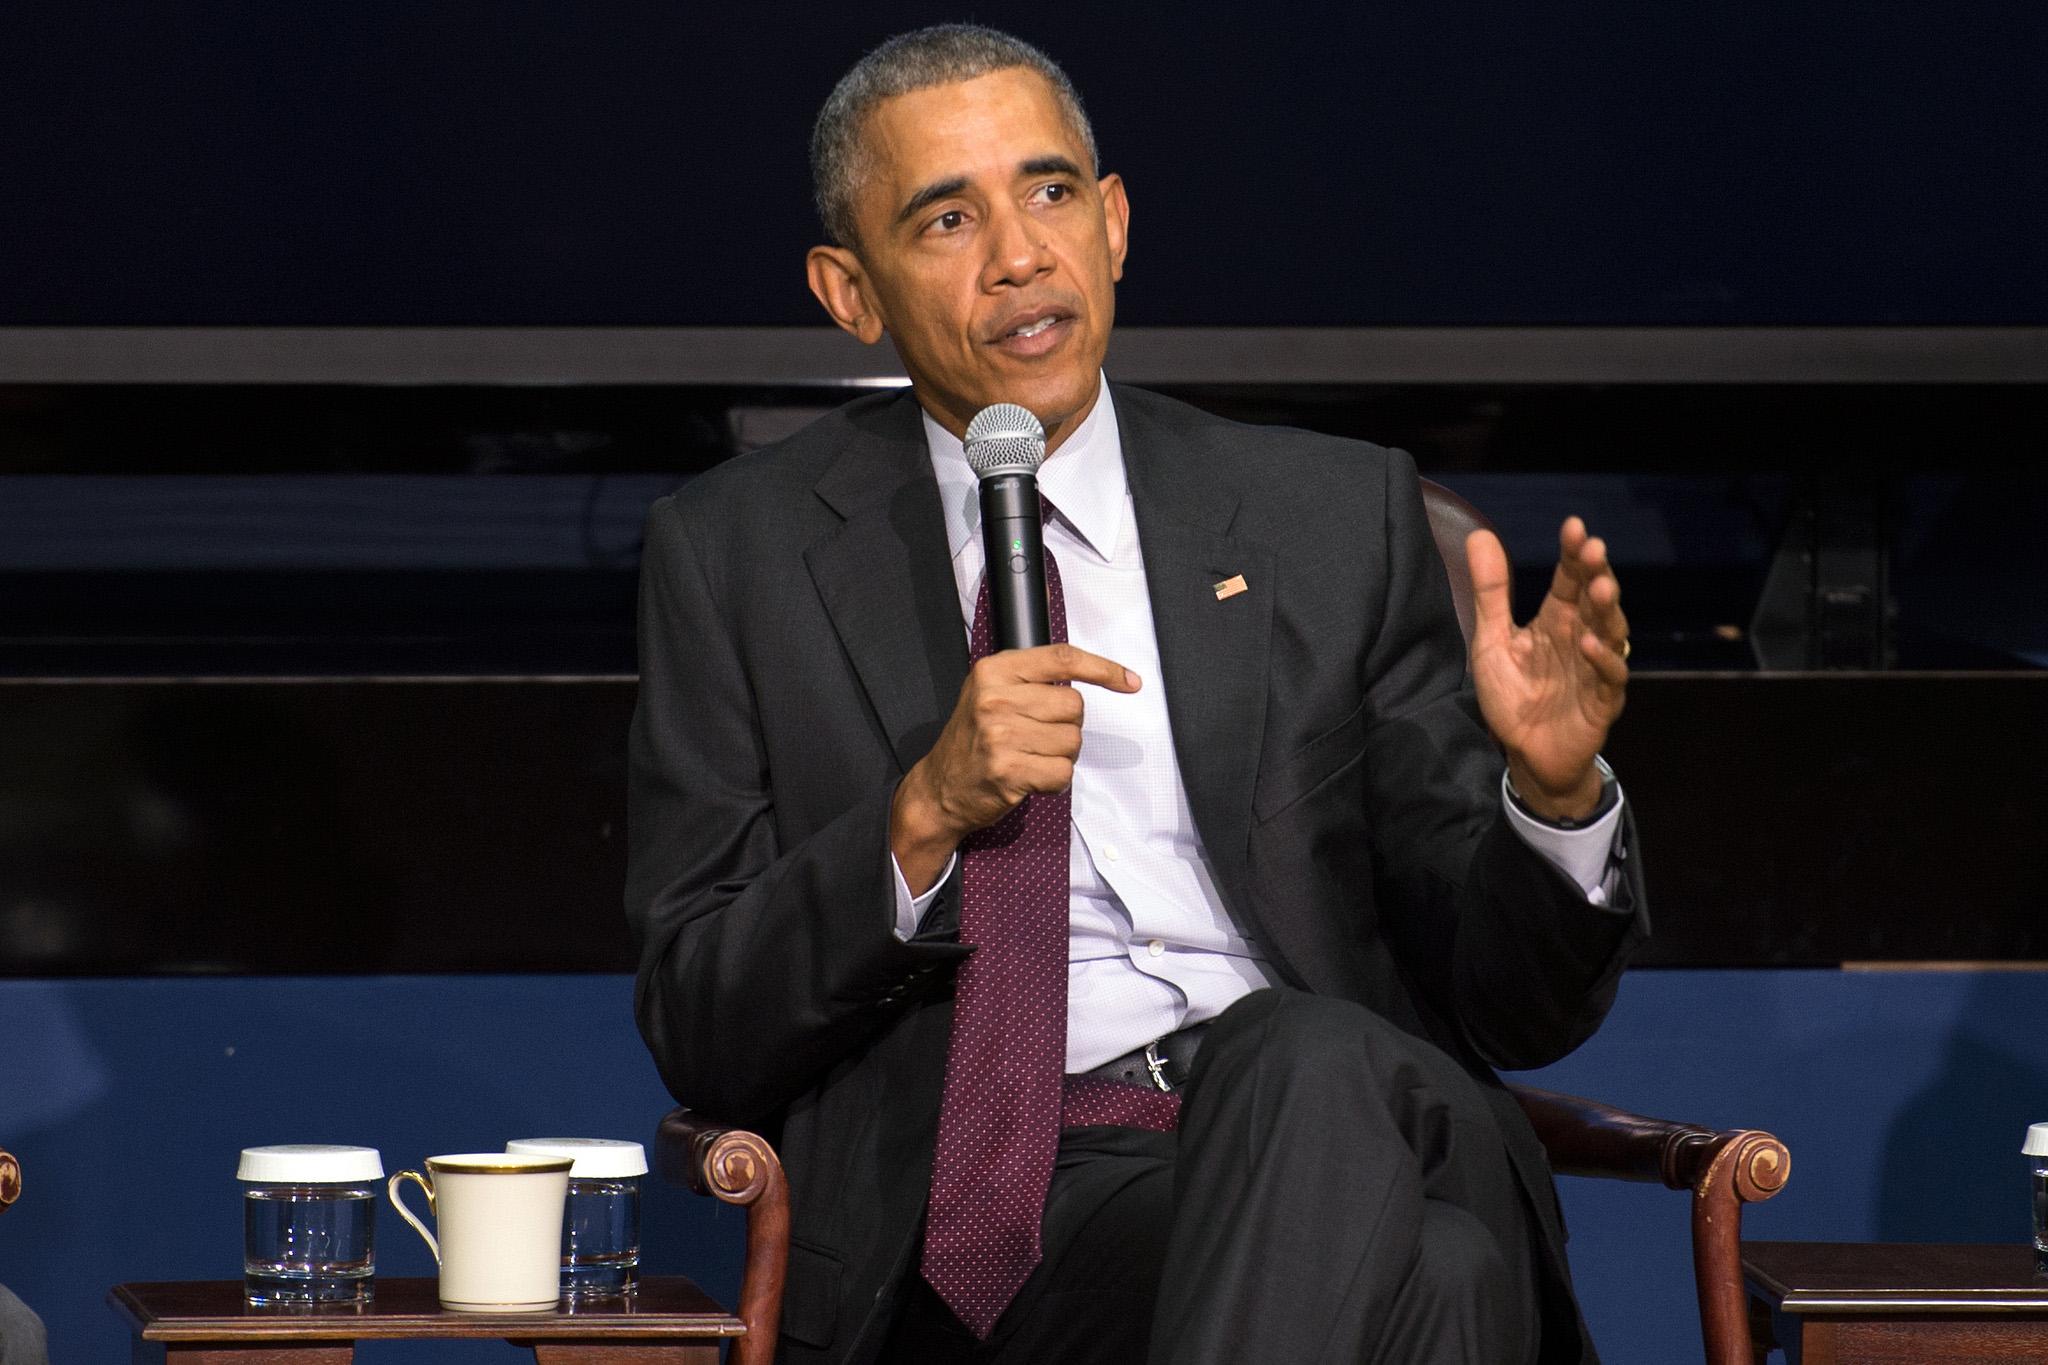 Obama Political Courage